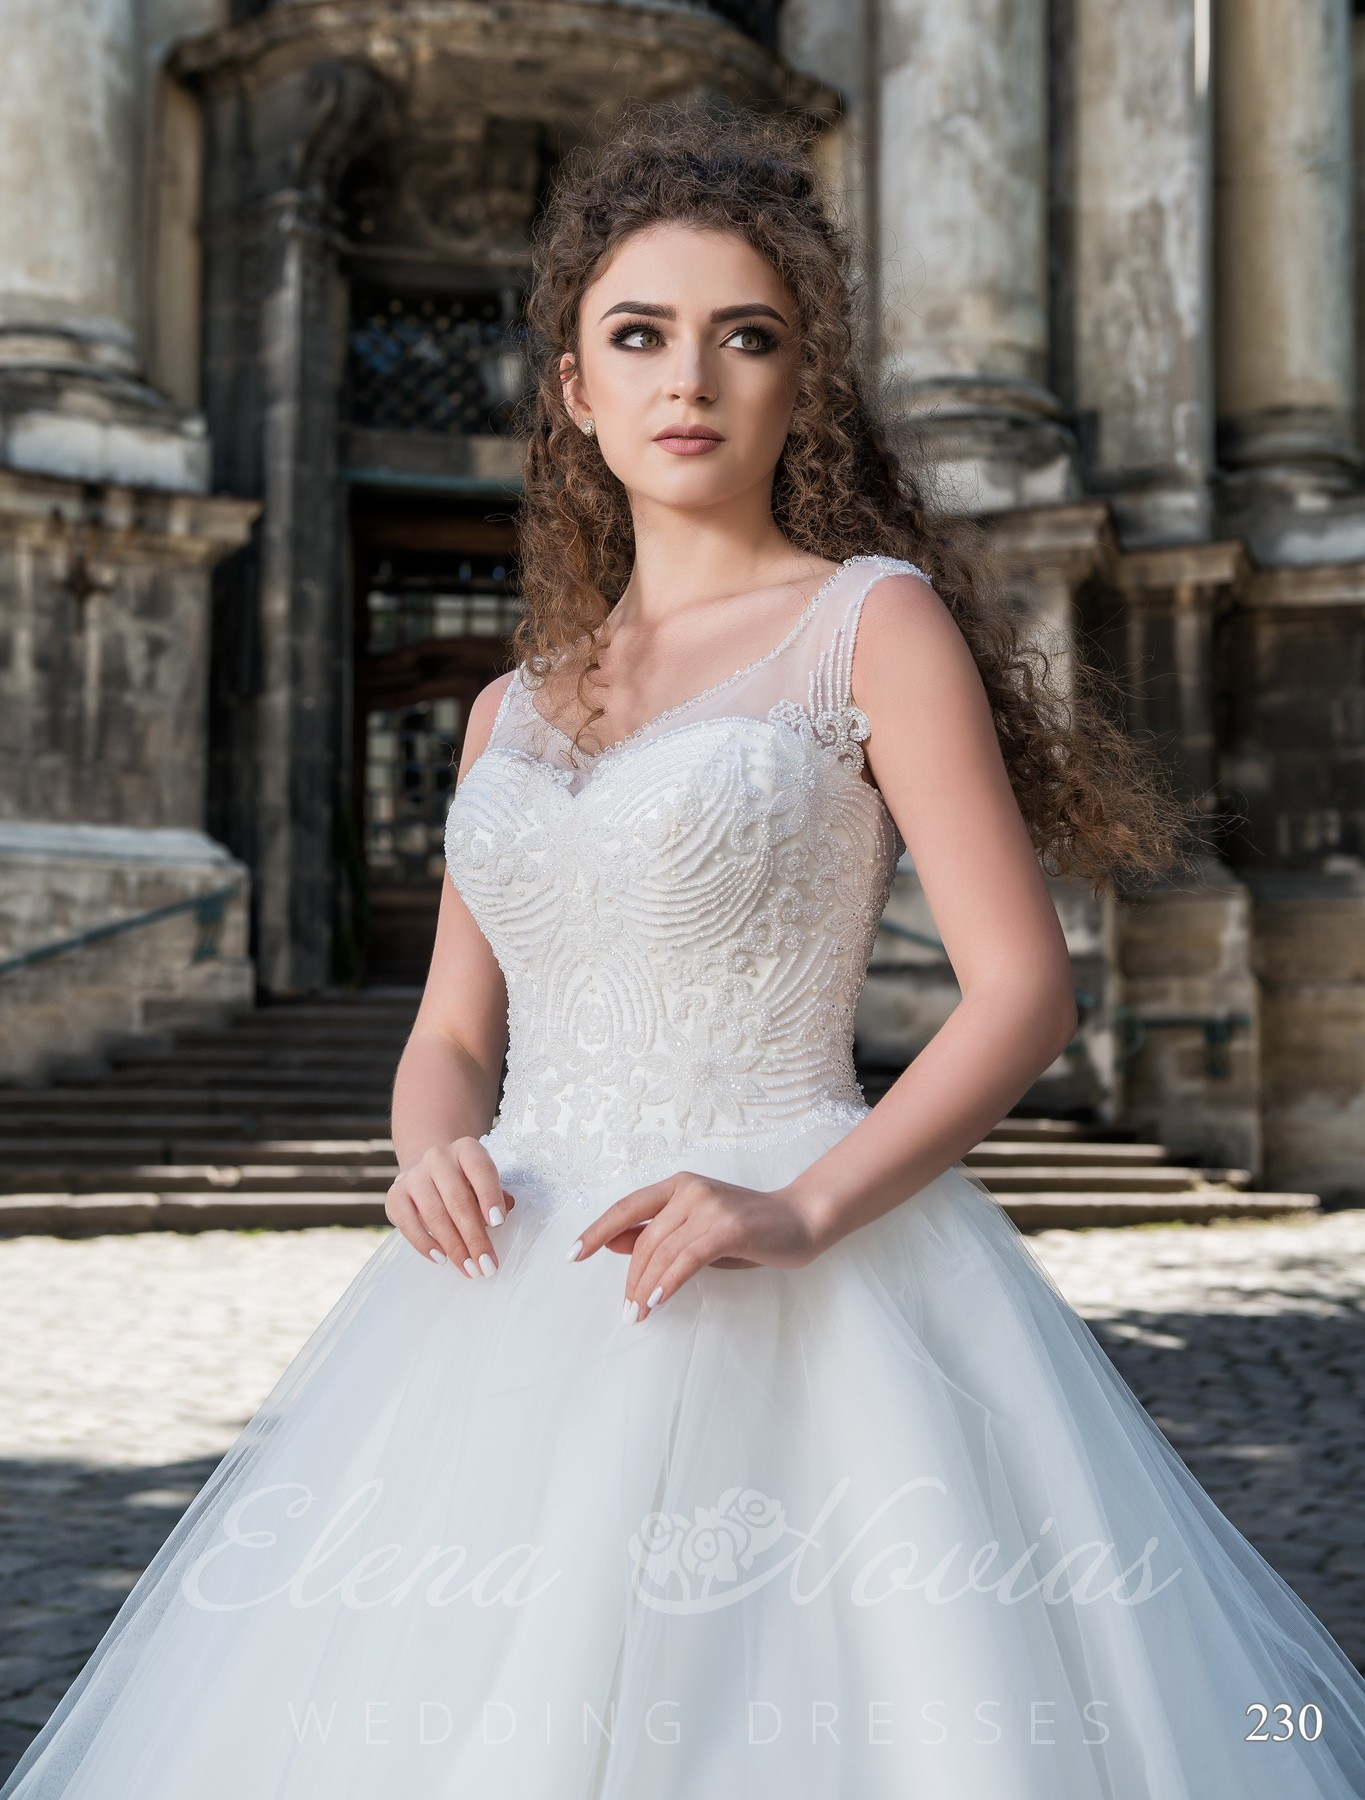 bd2272e9eb Chiffon wedding dress 230